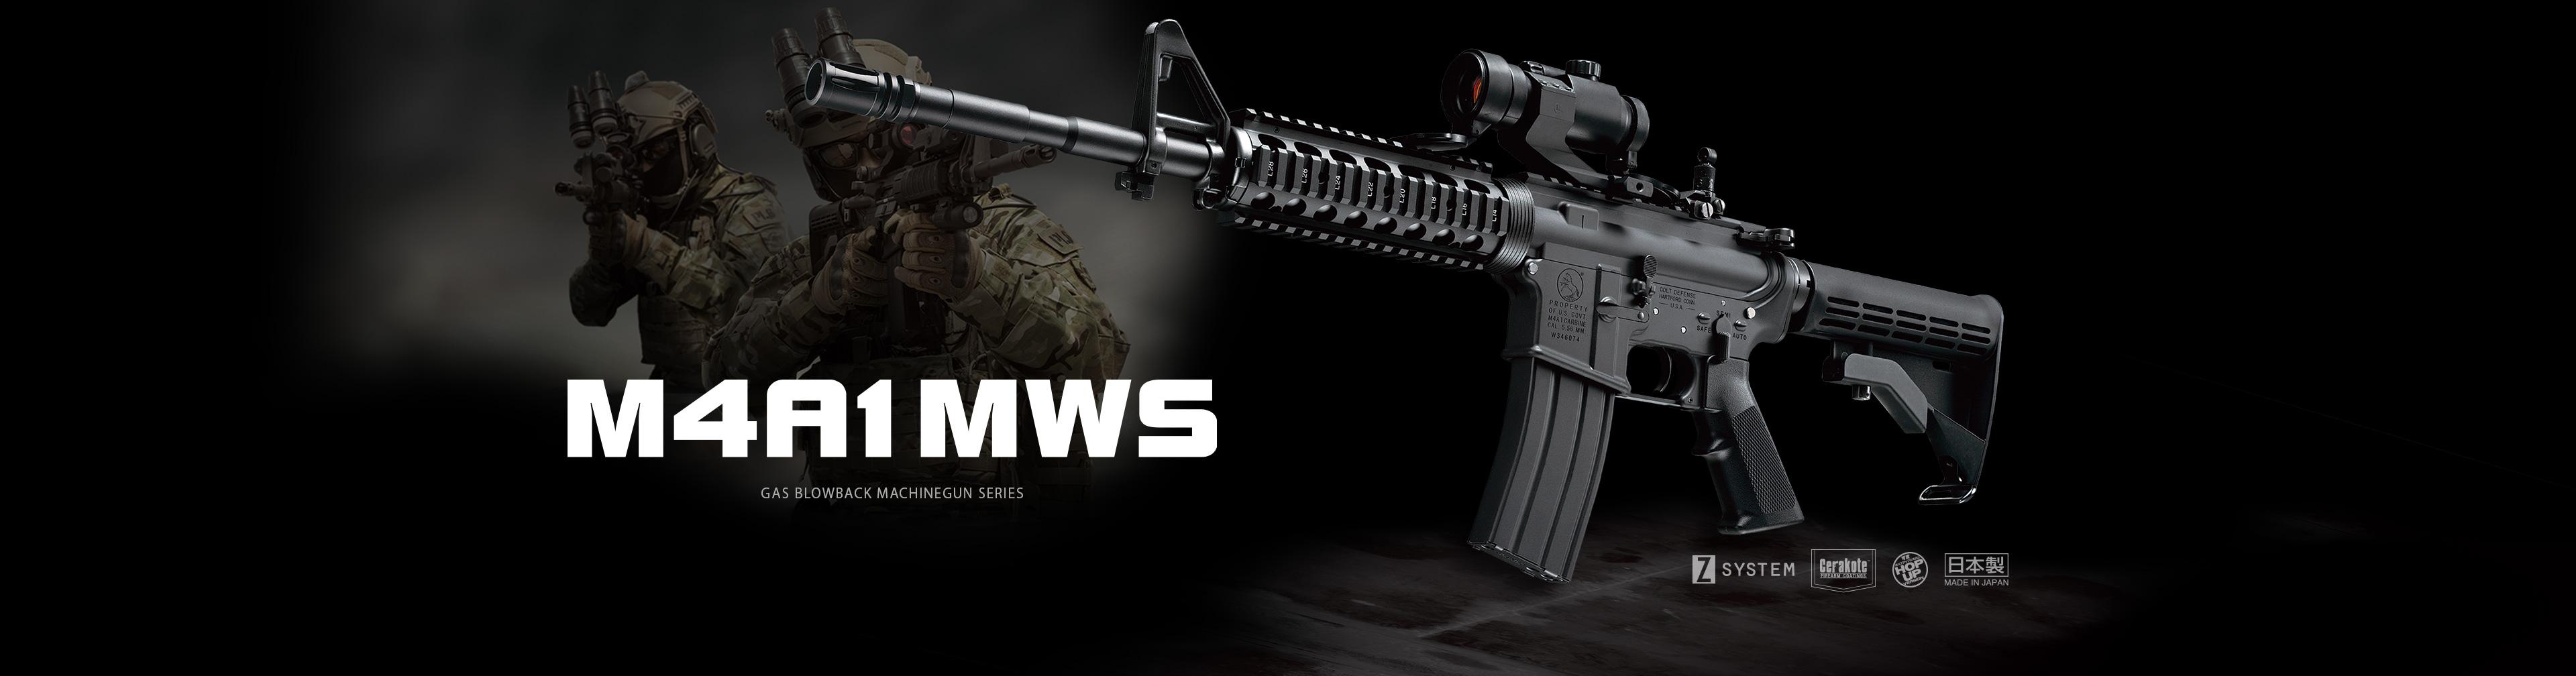 M4A1 MWS